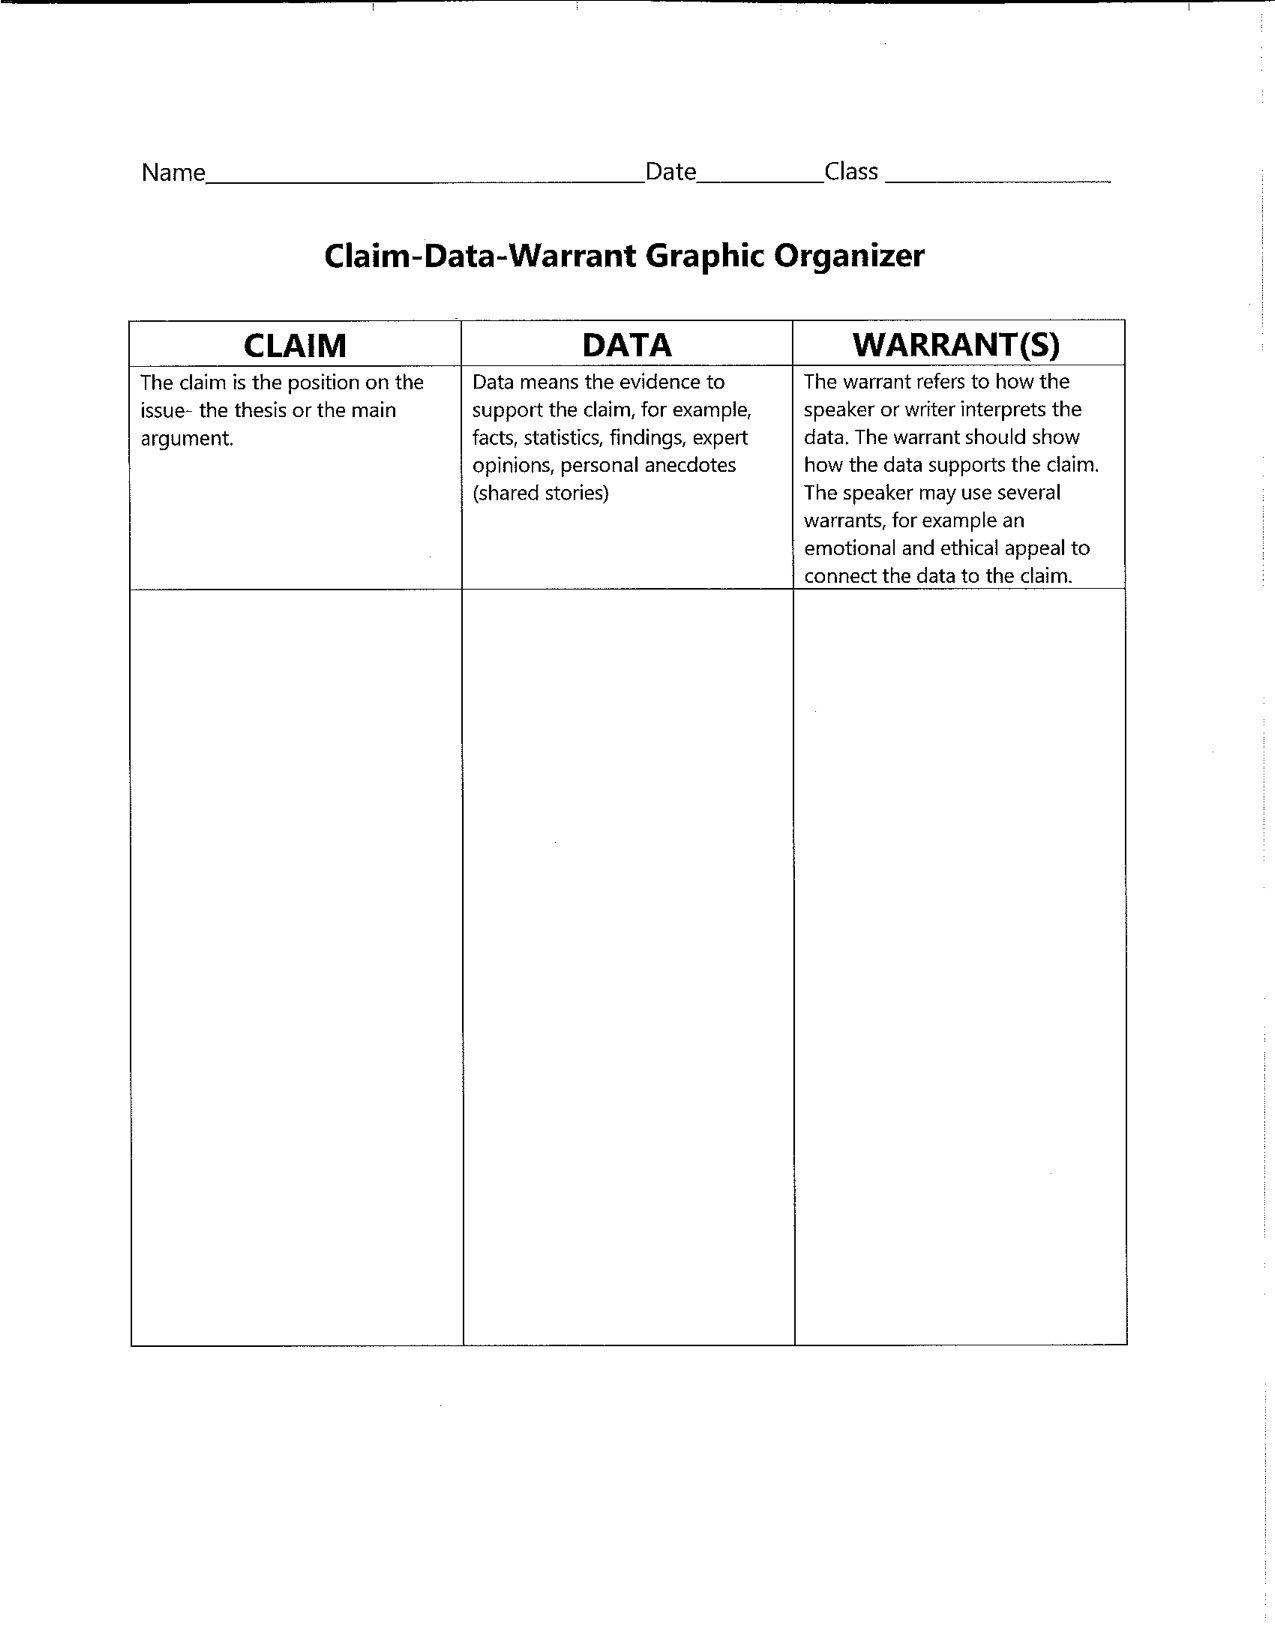 Claim Data Warrant Graphic Organizer